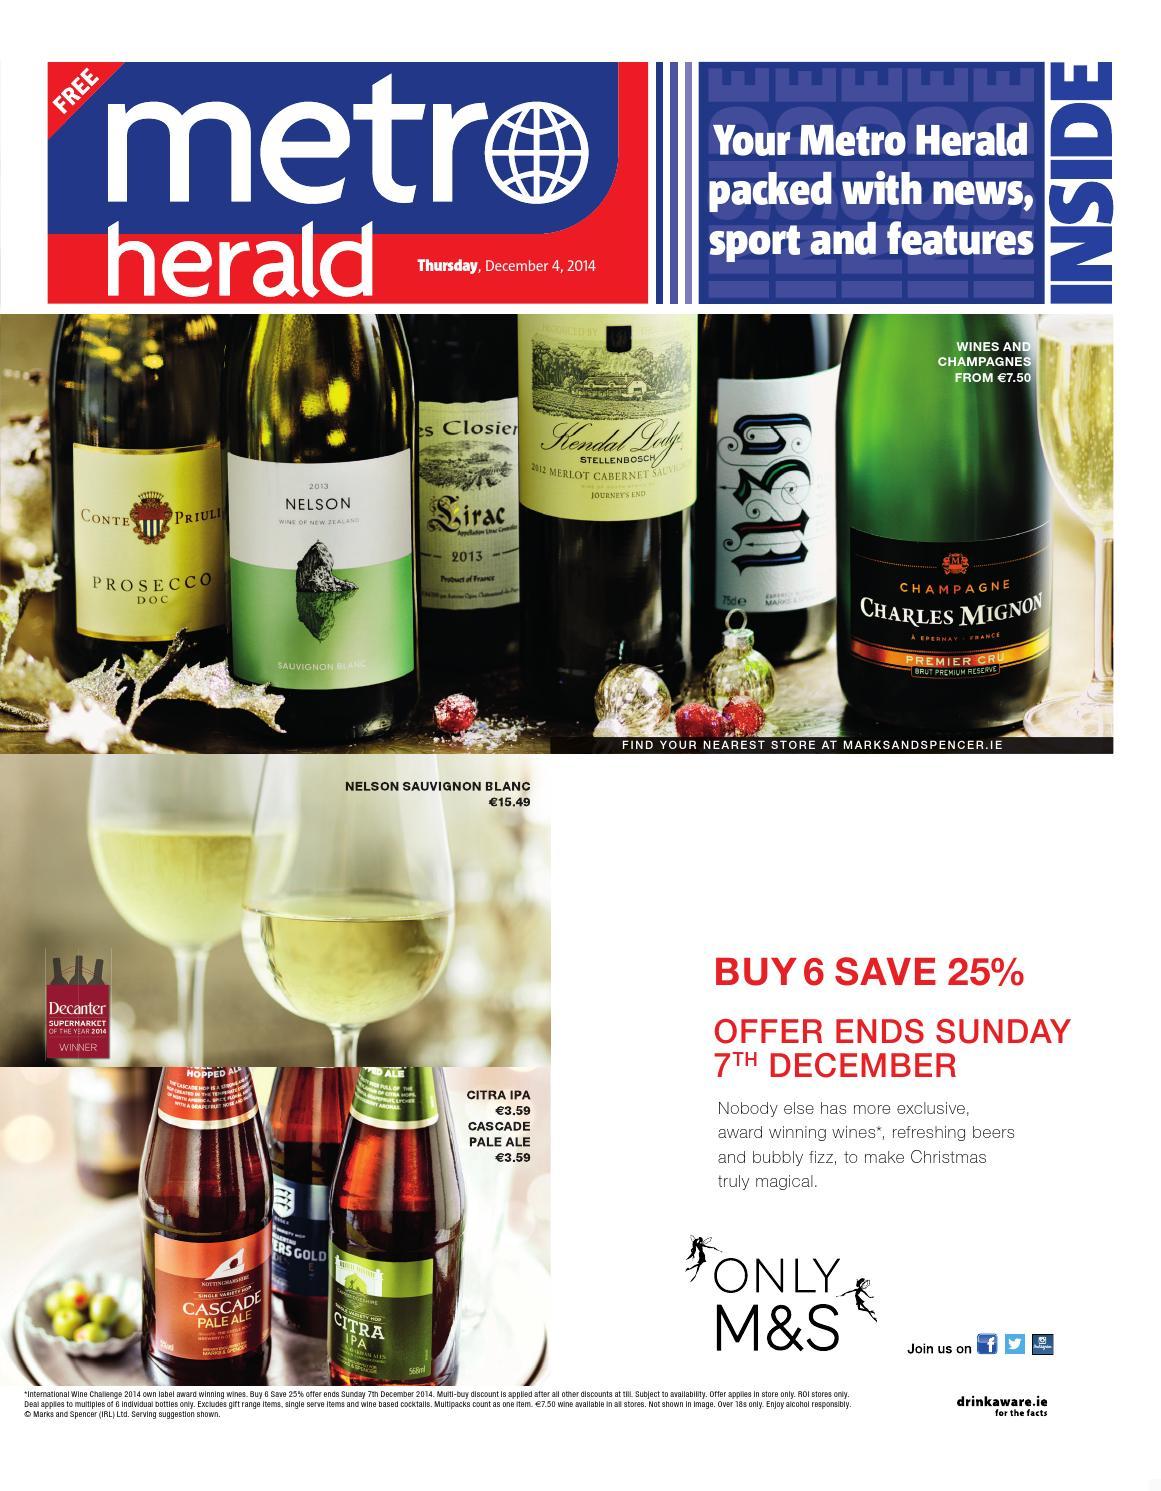 5x 3d Silver Tone Wine Champagne Bottle Charm Pendants CLEARANCE BARGAIN UK